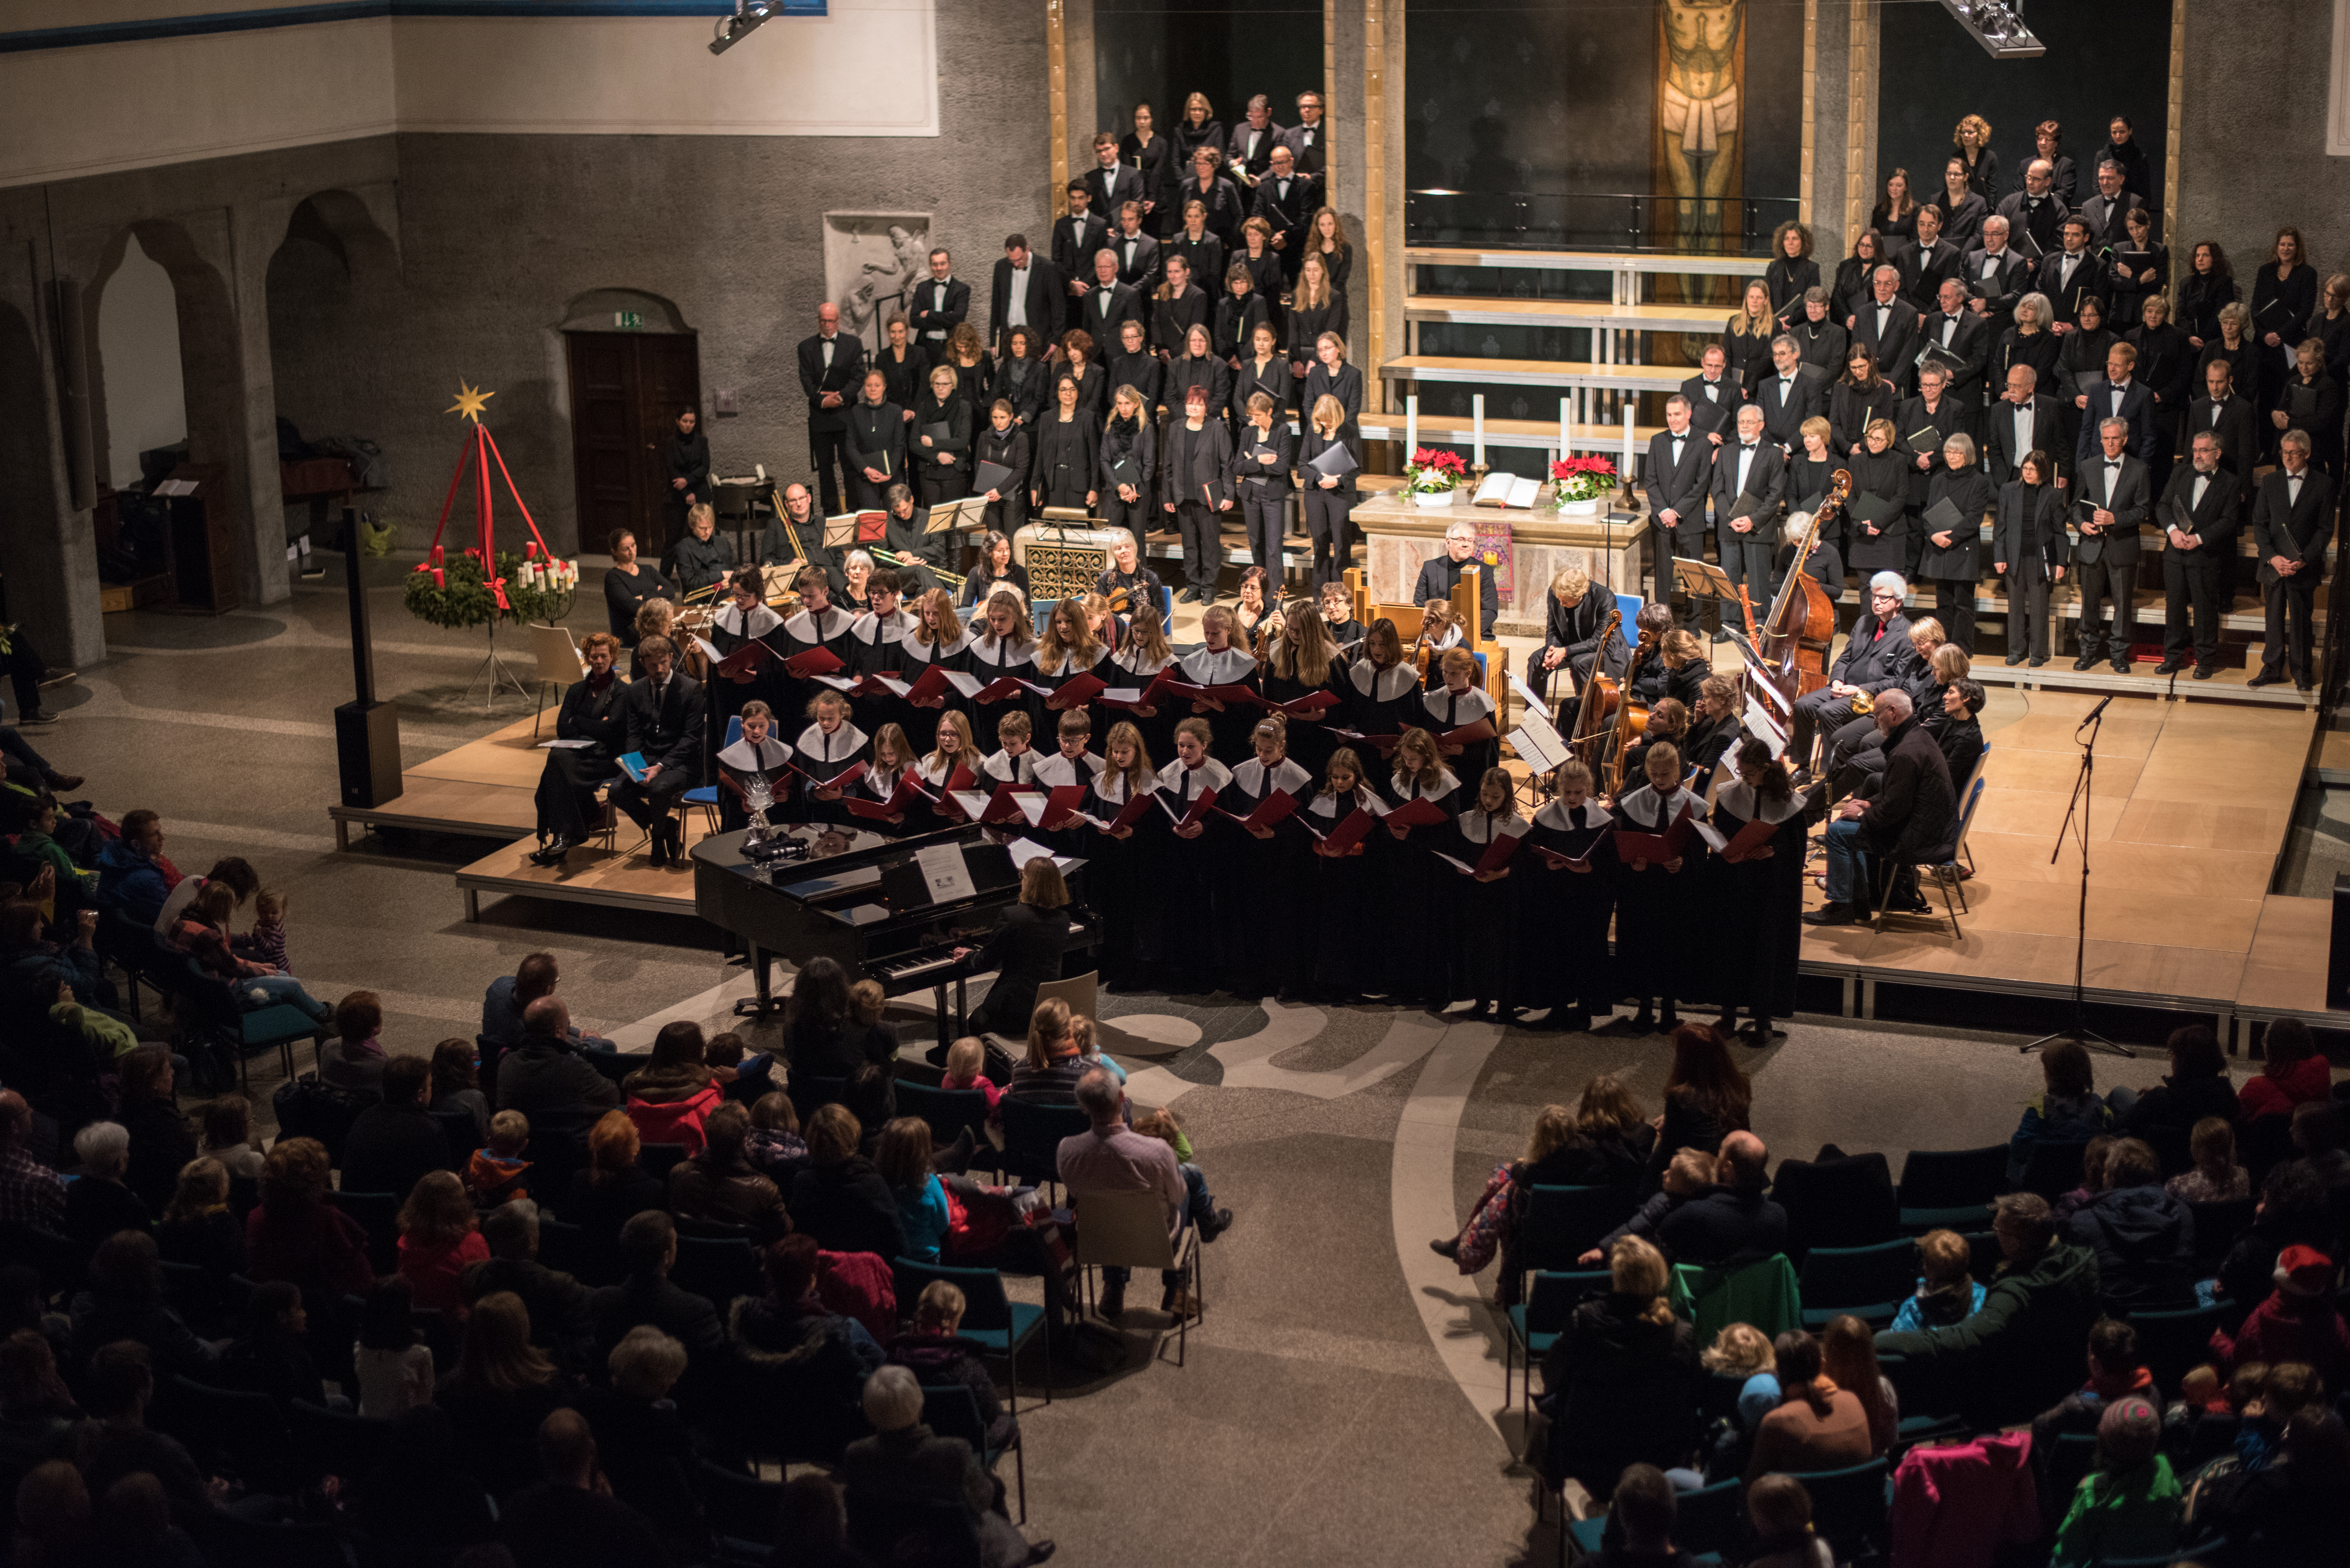 2015 WO Pauluskirche Motettenchor-71